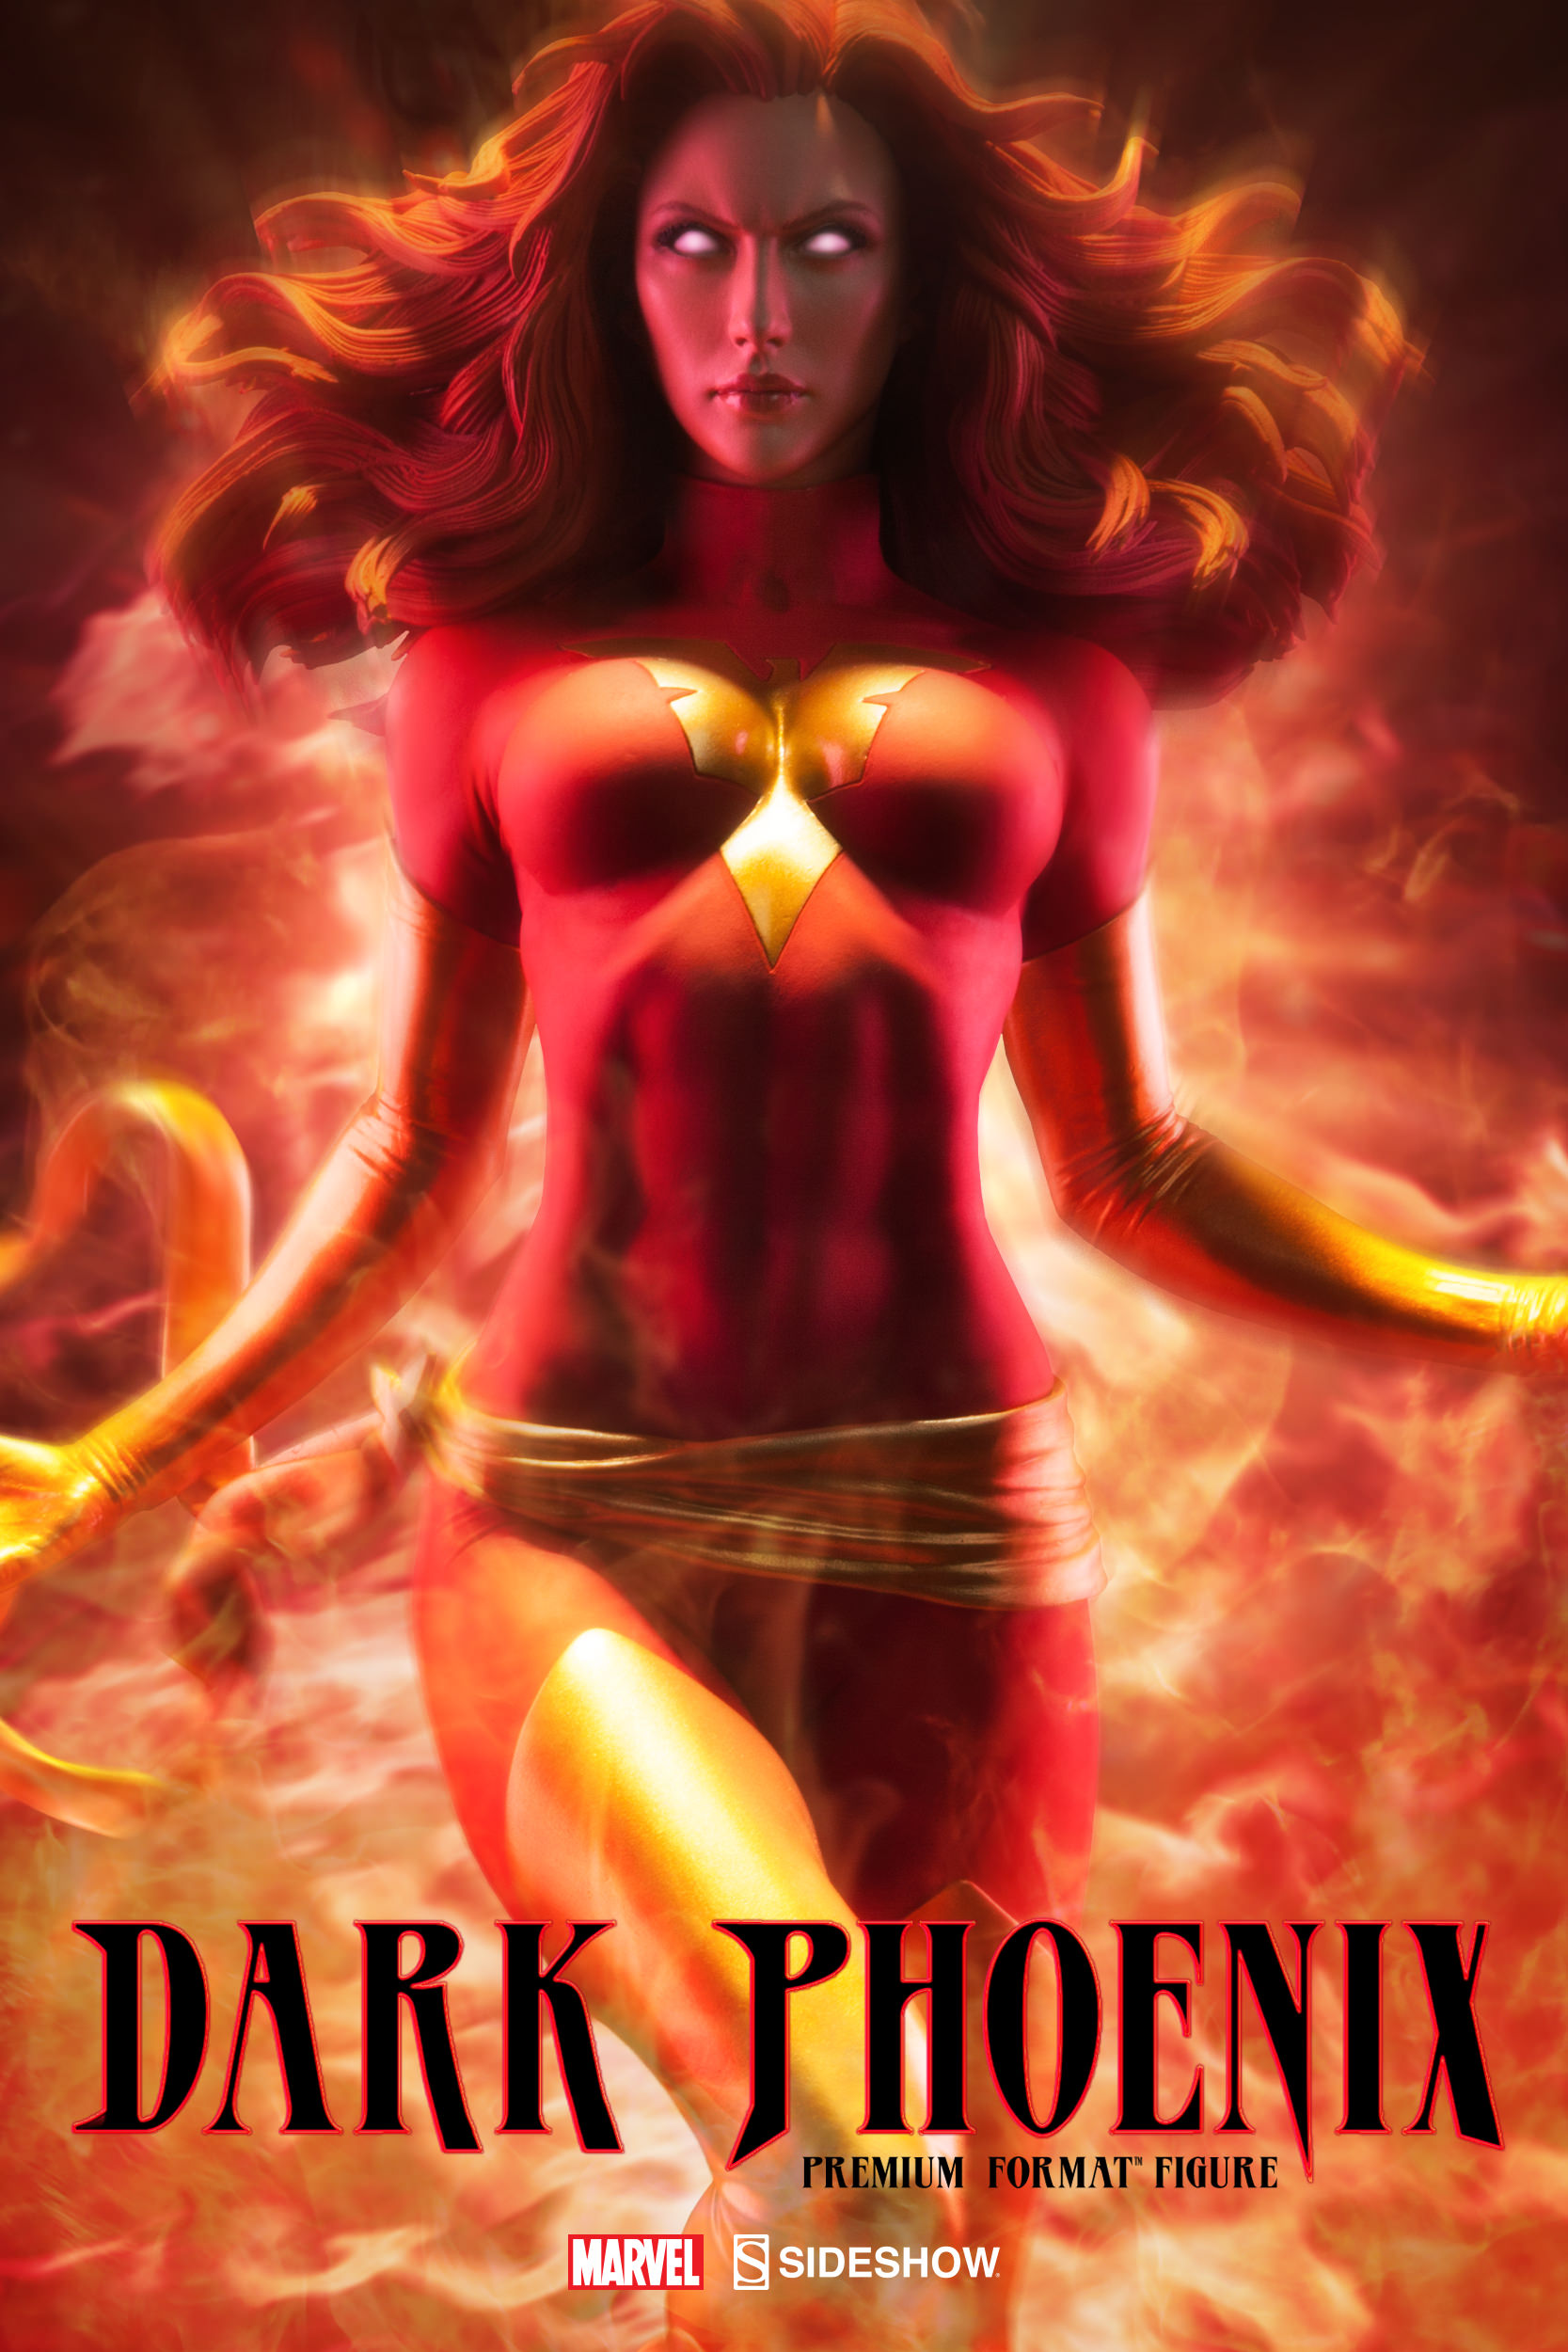 Details On Sideshow's Dark Phoenix Premium Format Figure